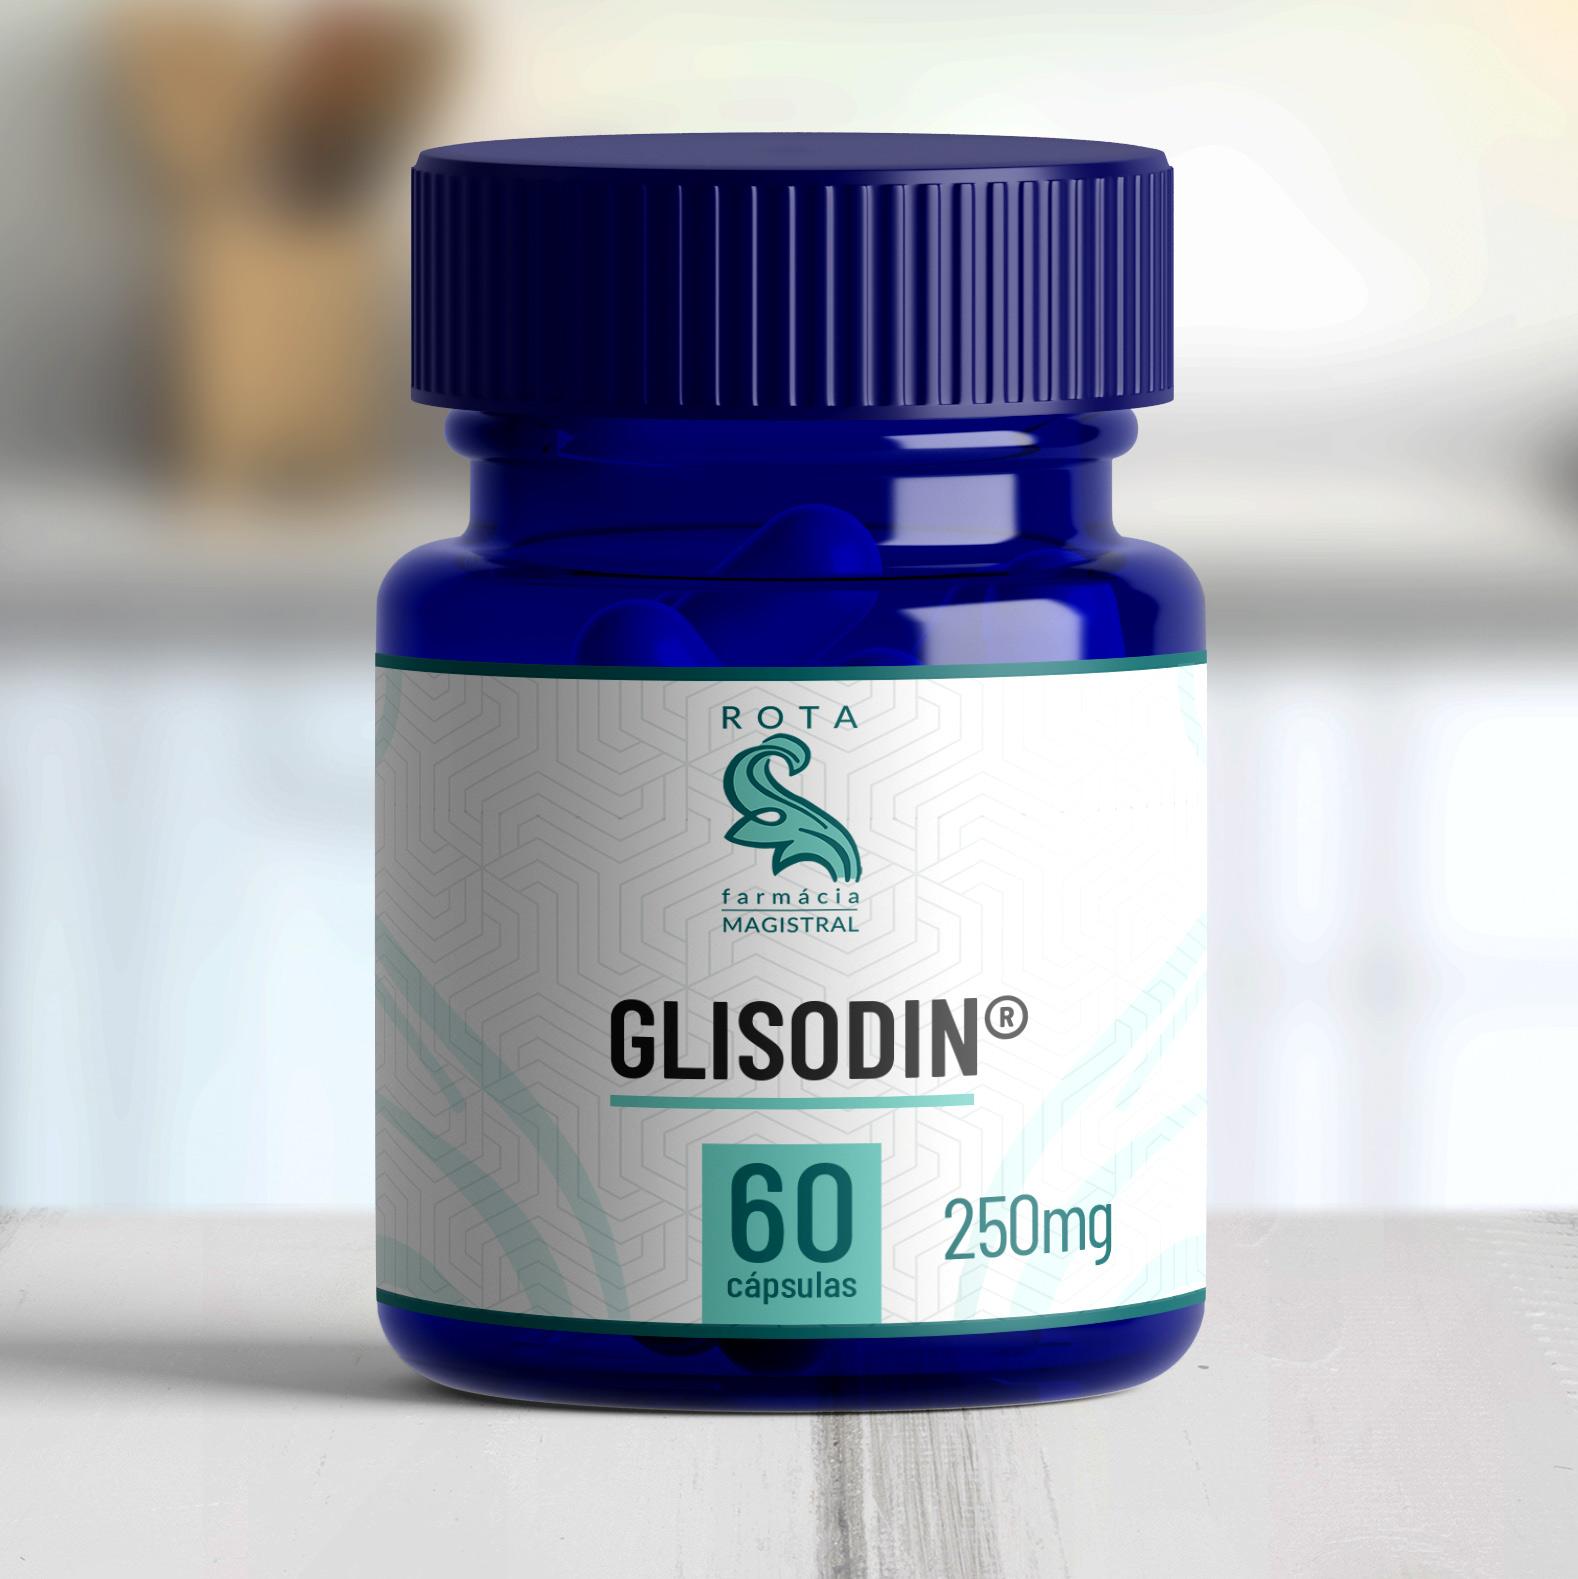 GliSODin ® 250mg 60 cápsulas